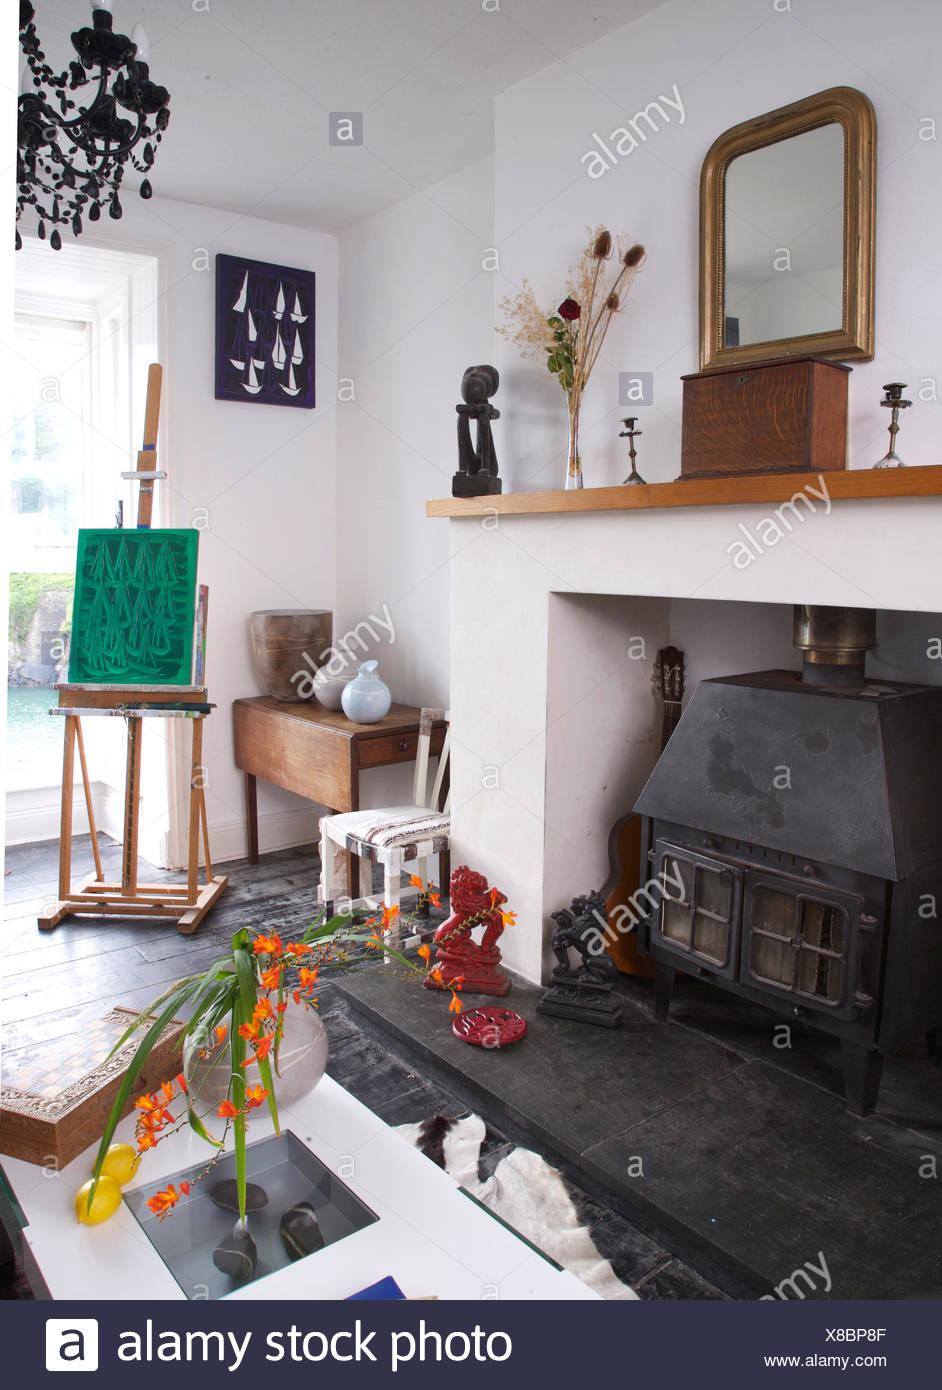 Wood Burning Stove In Coastal Cottage Living Room Stock